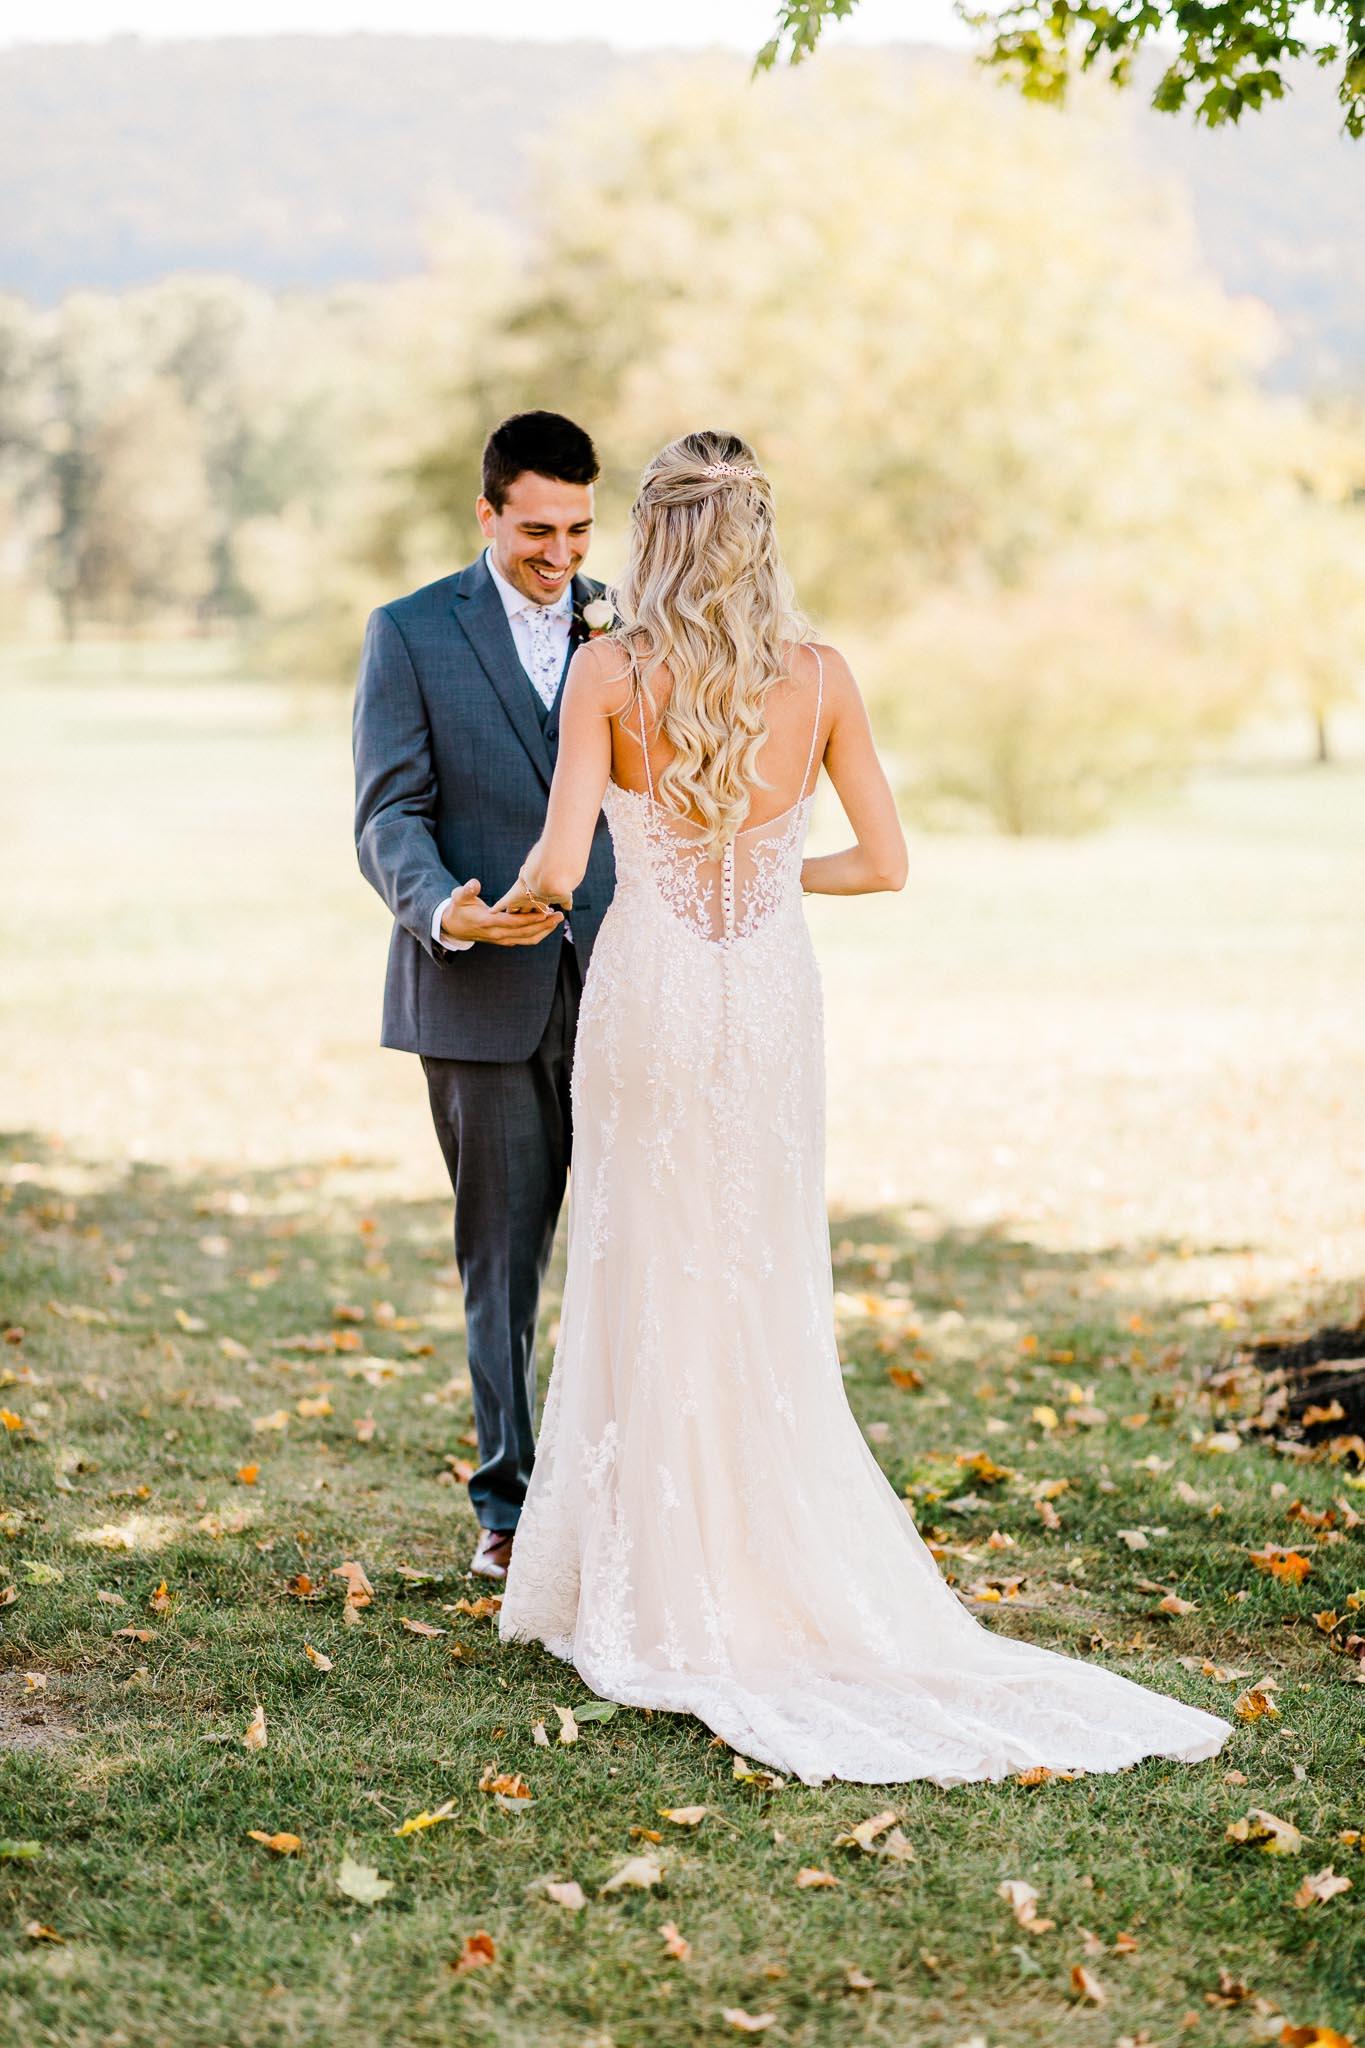 Frosty-Valley-September-Wedding-7171.jpg